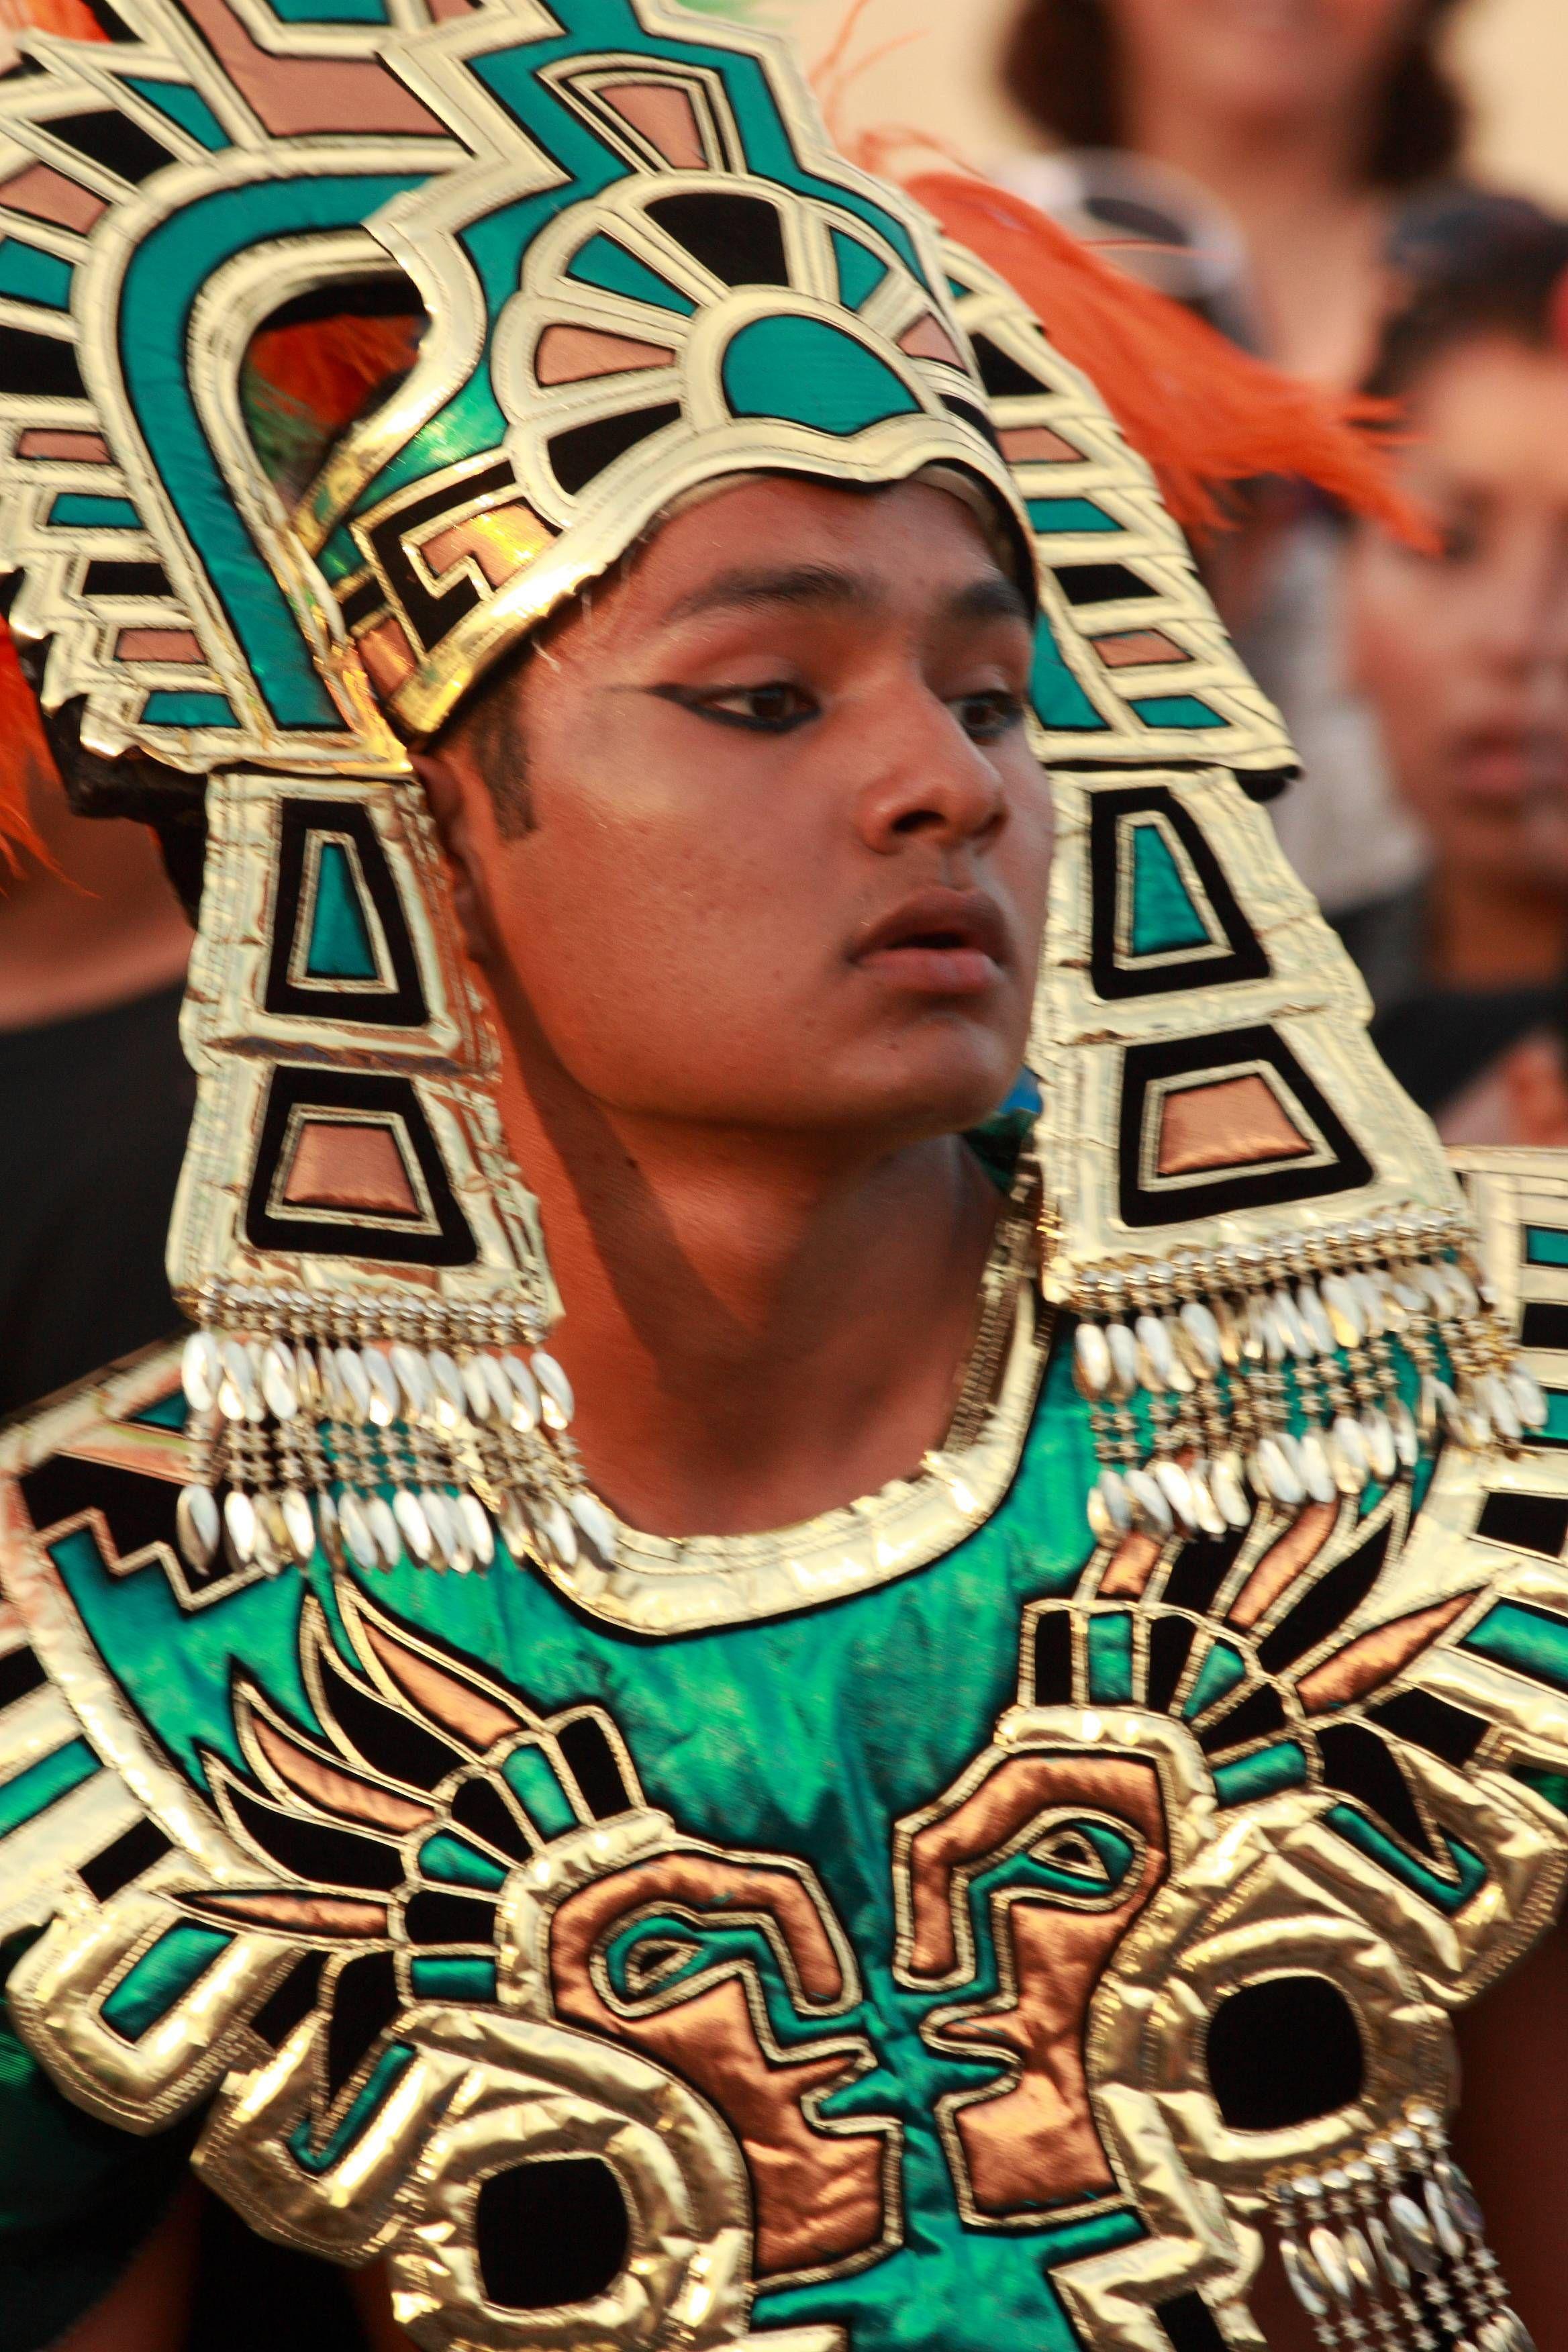 Mexican tribal teen #8